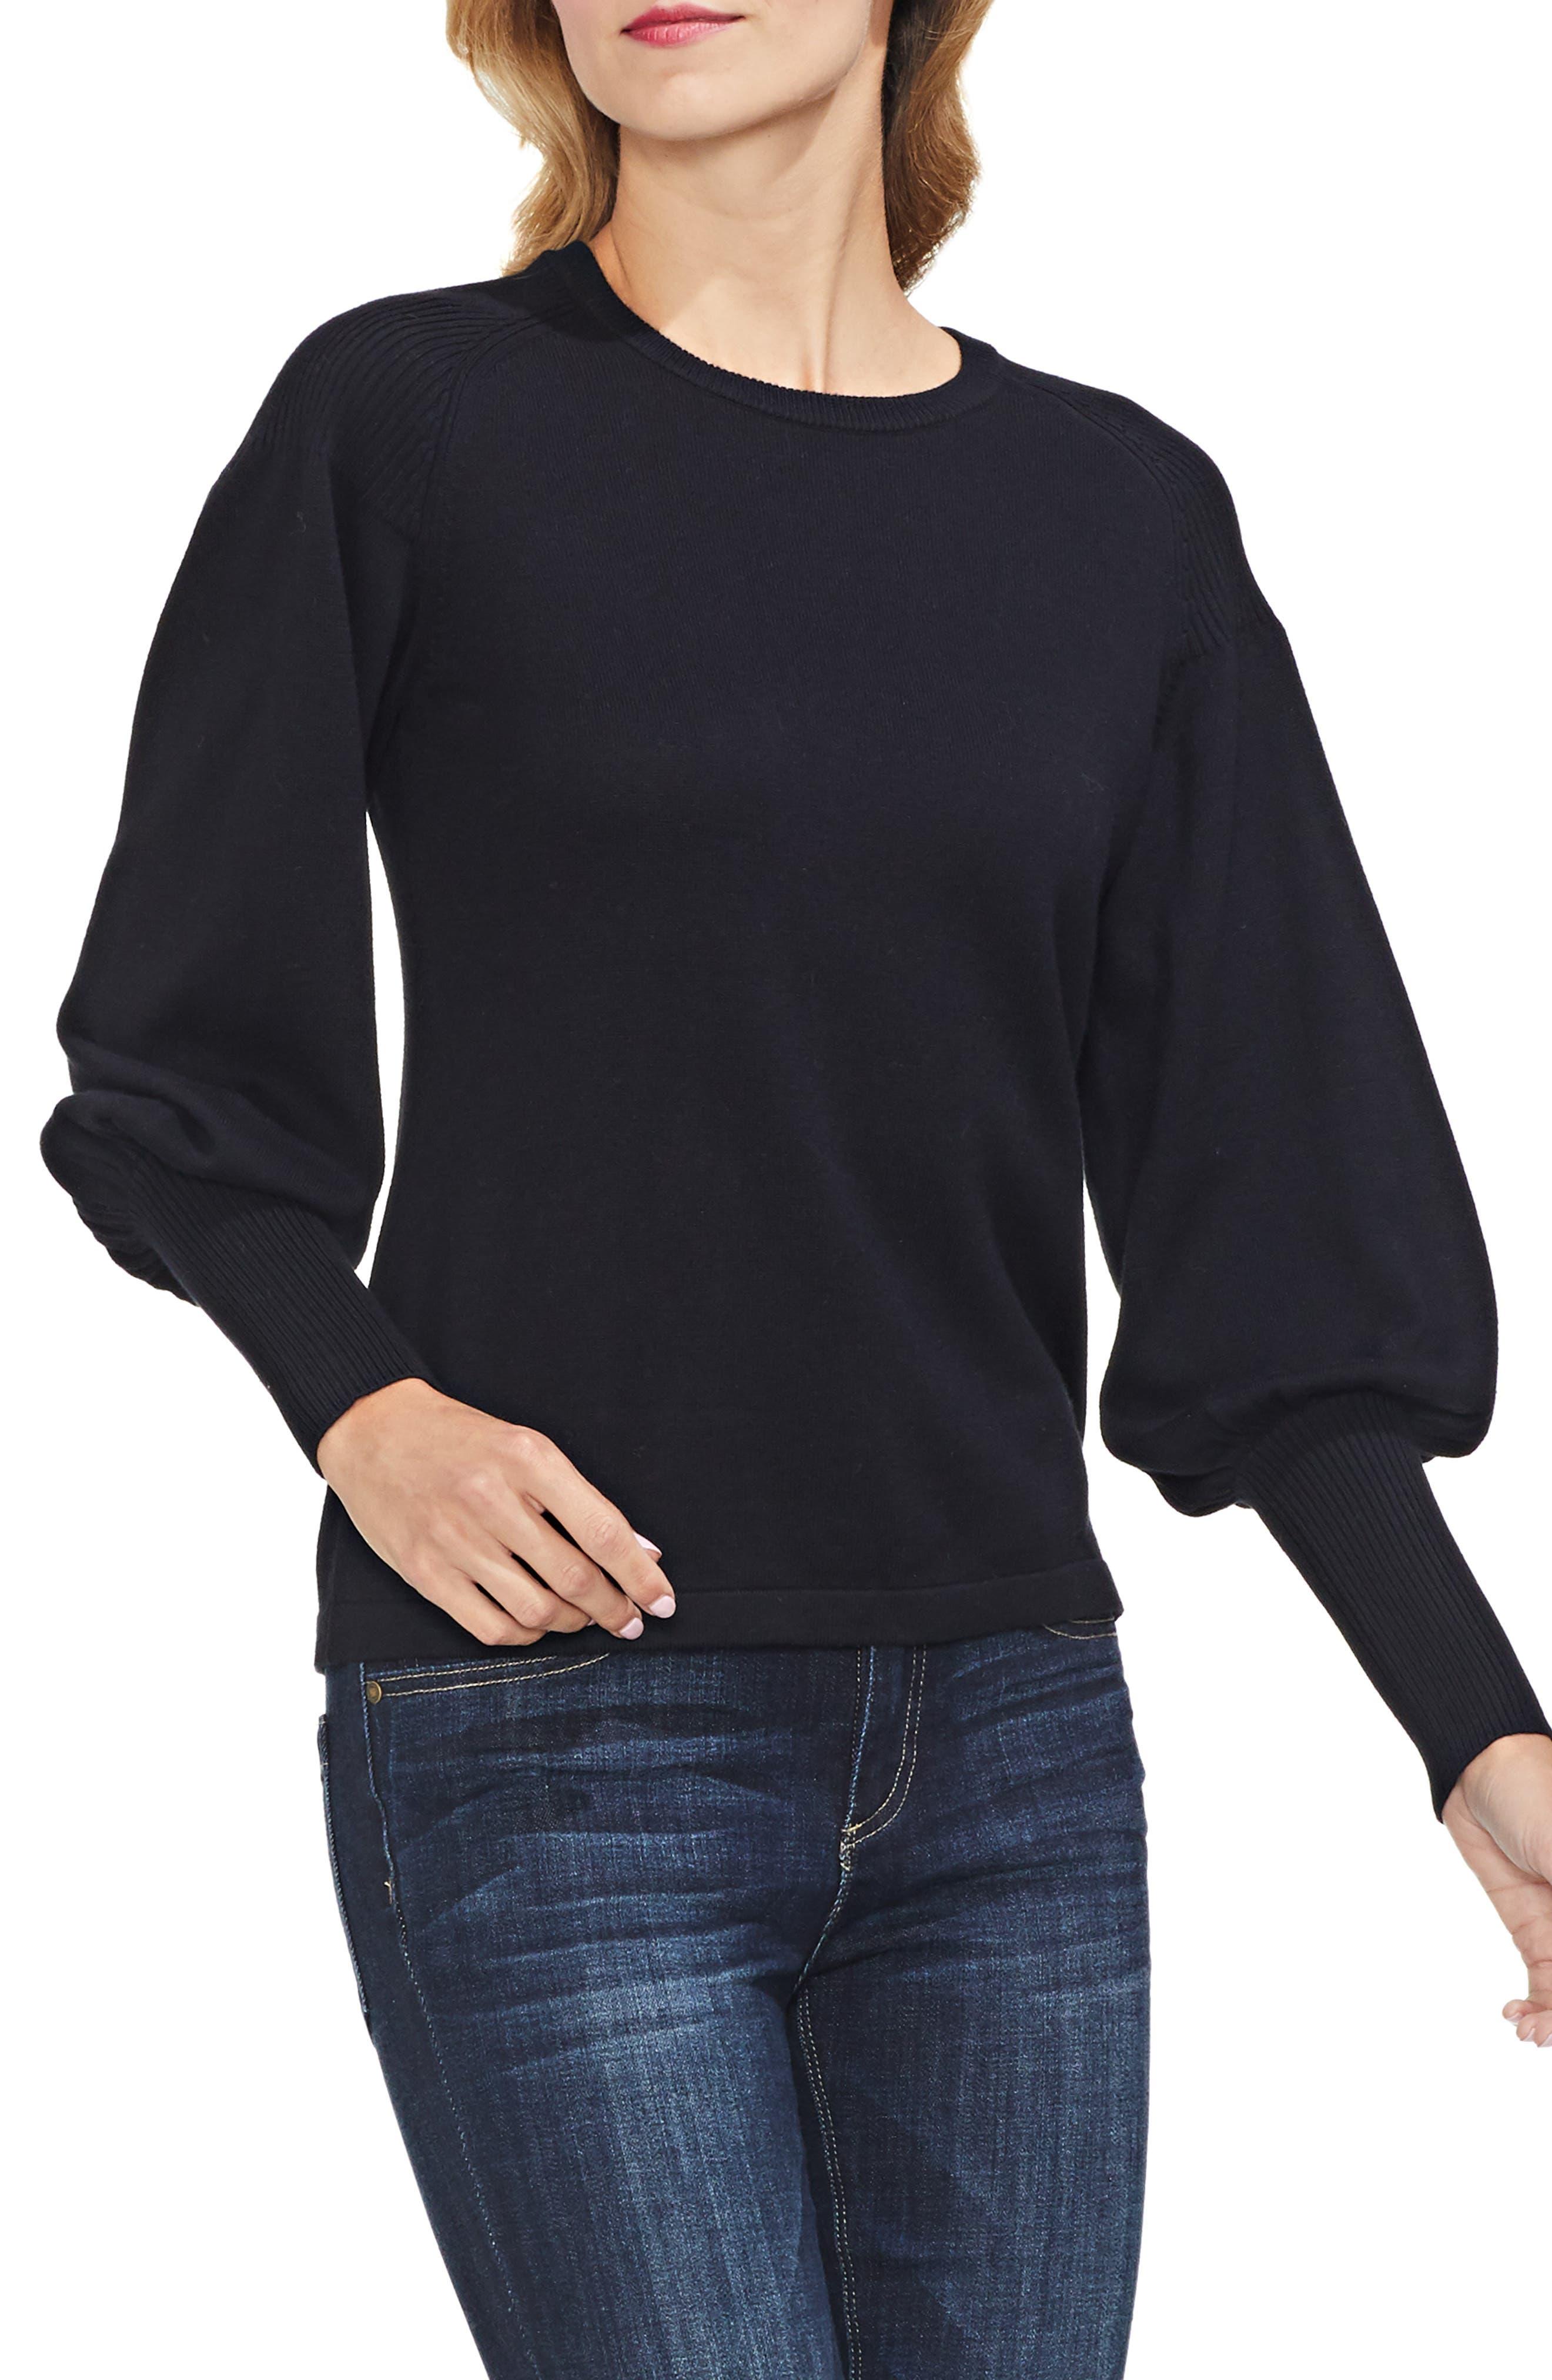 Blouson Sleeve Sweater,                             Main thumbnail 1, color,                             006